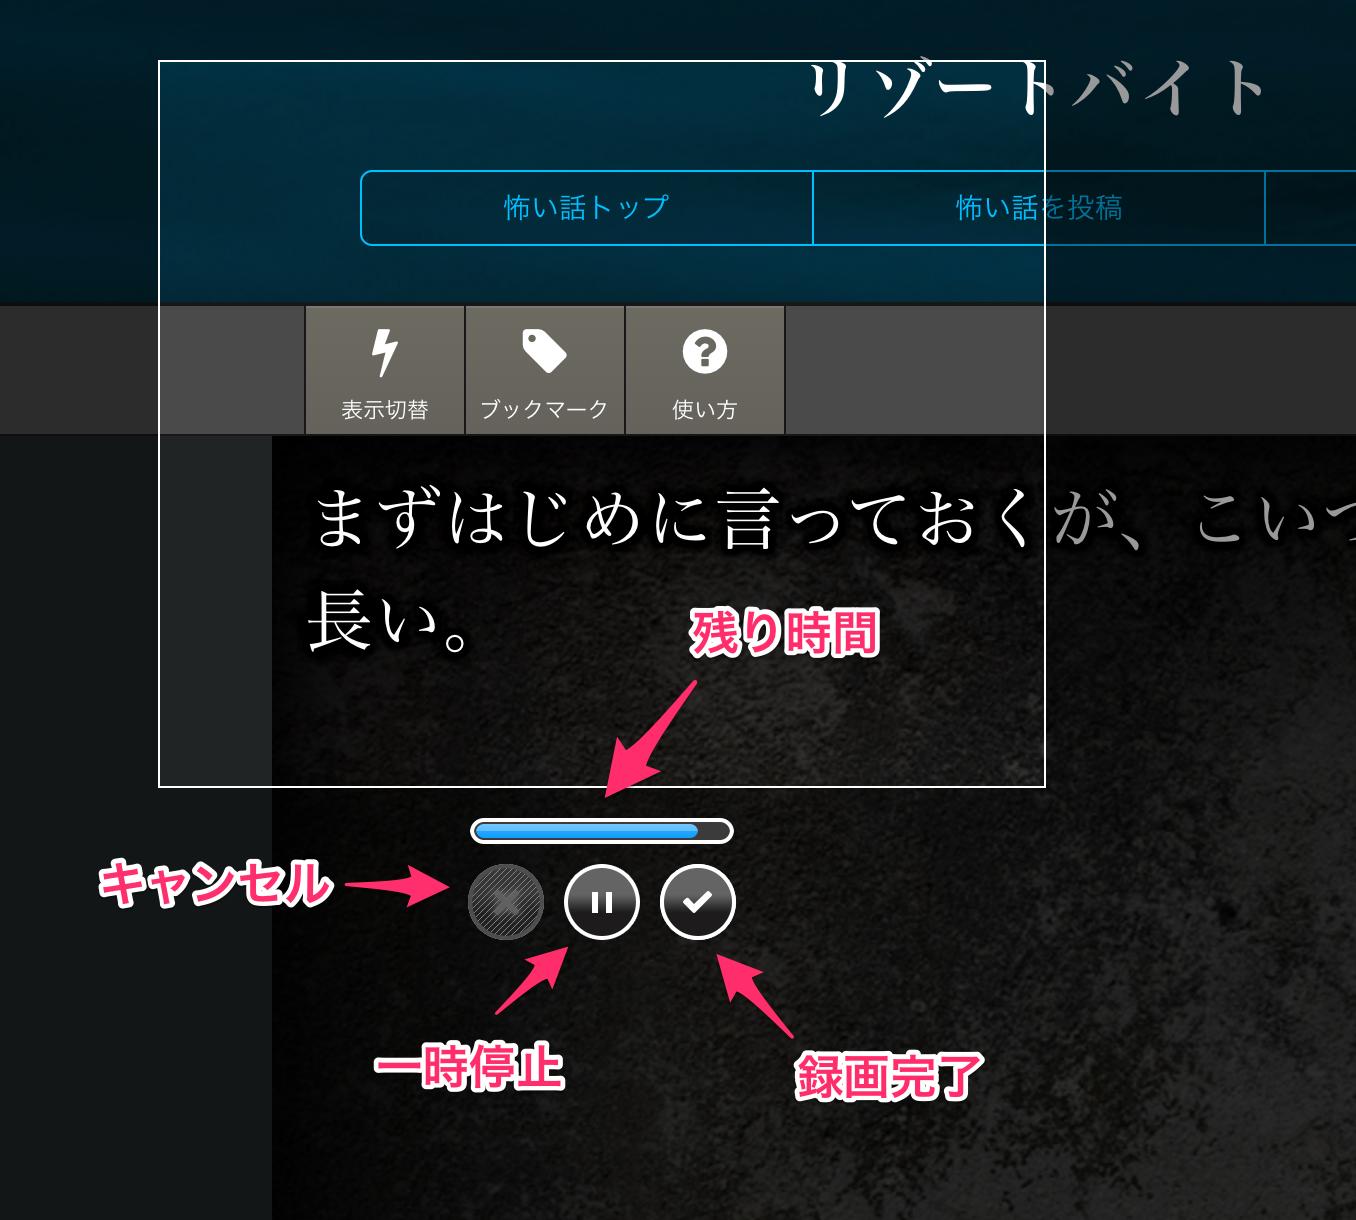 Gyazo GIFの操作方法 image md